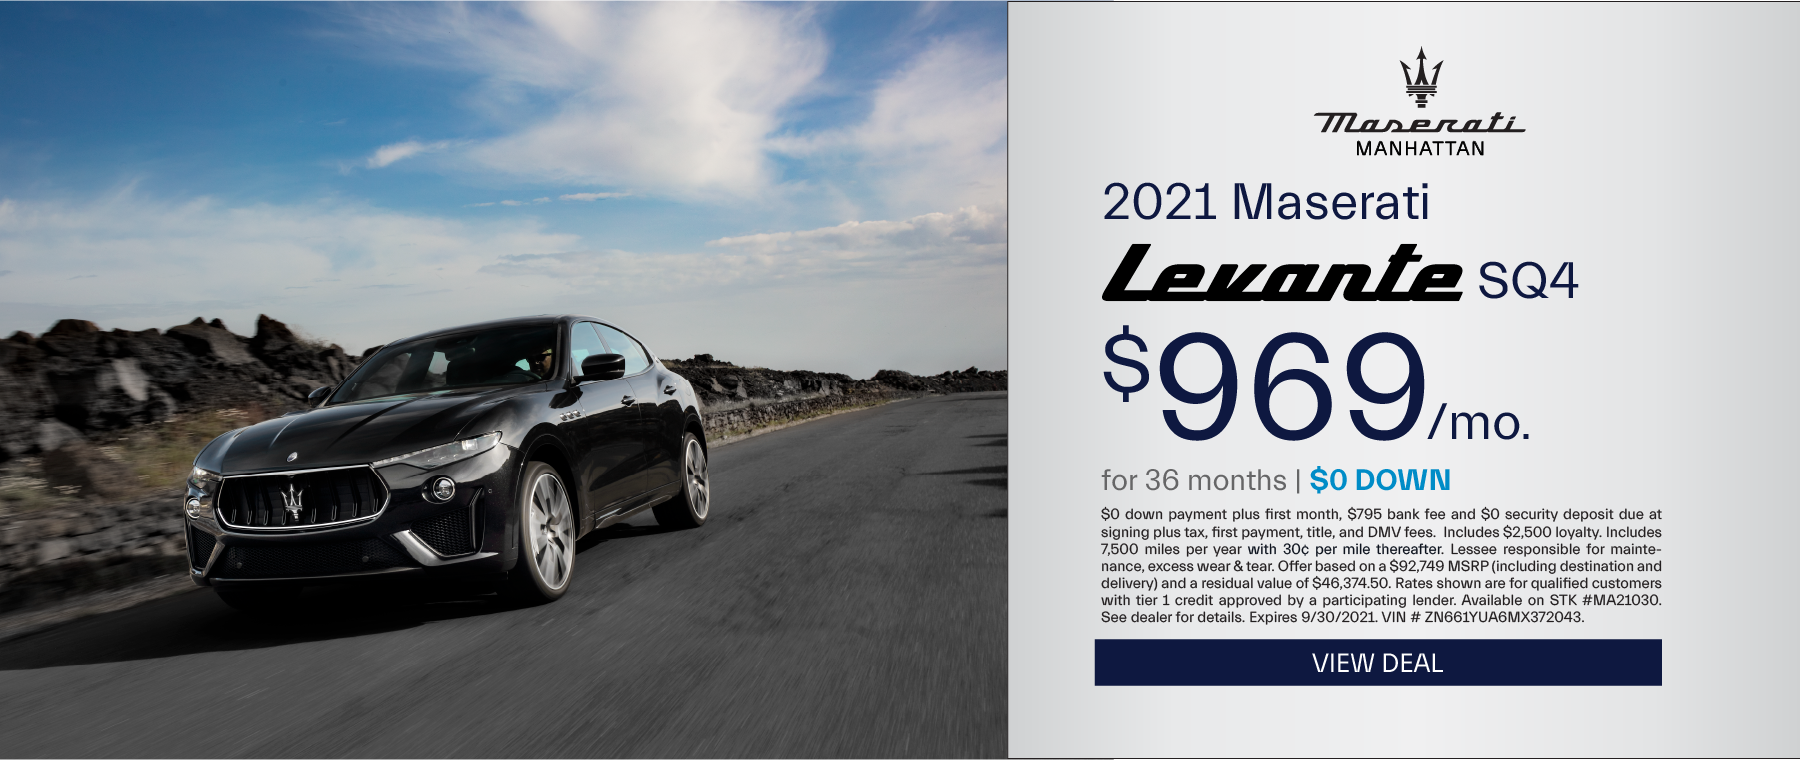 Maserati of Manhattan – 2021 Levante SQ4 – September 2021 – update2